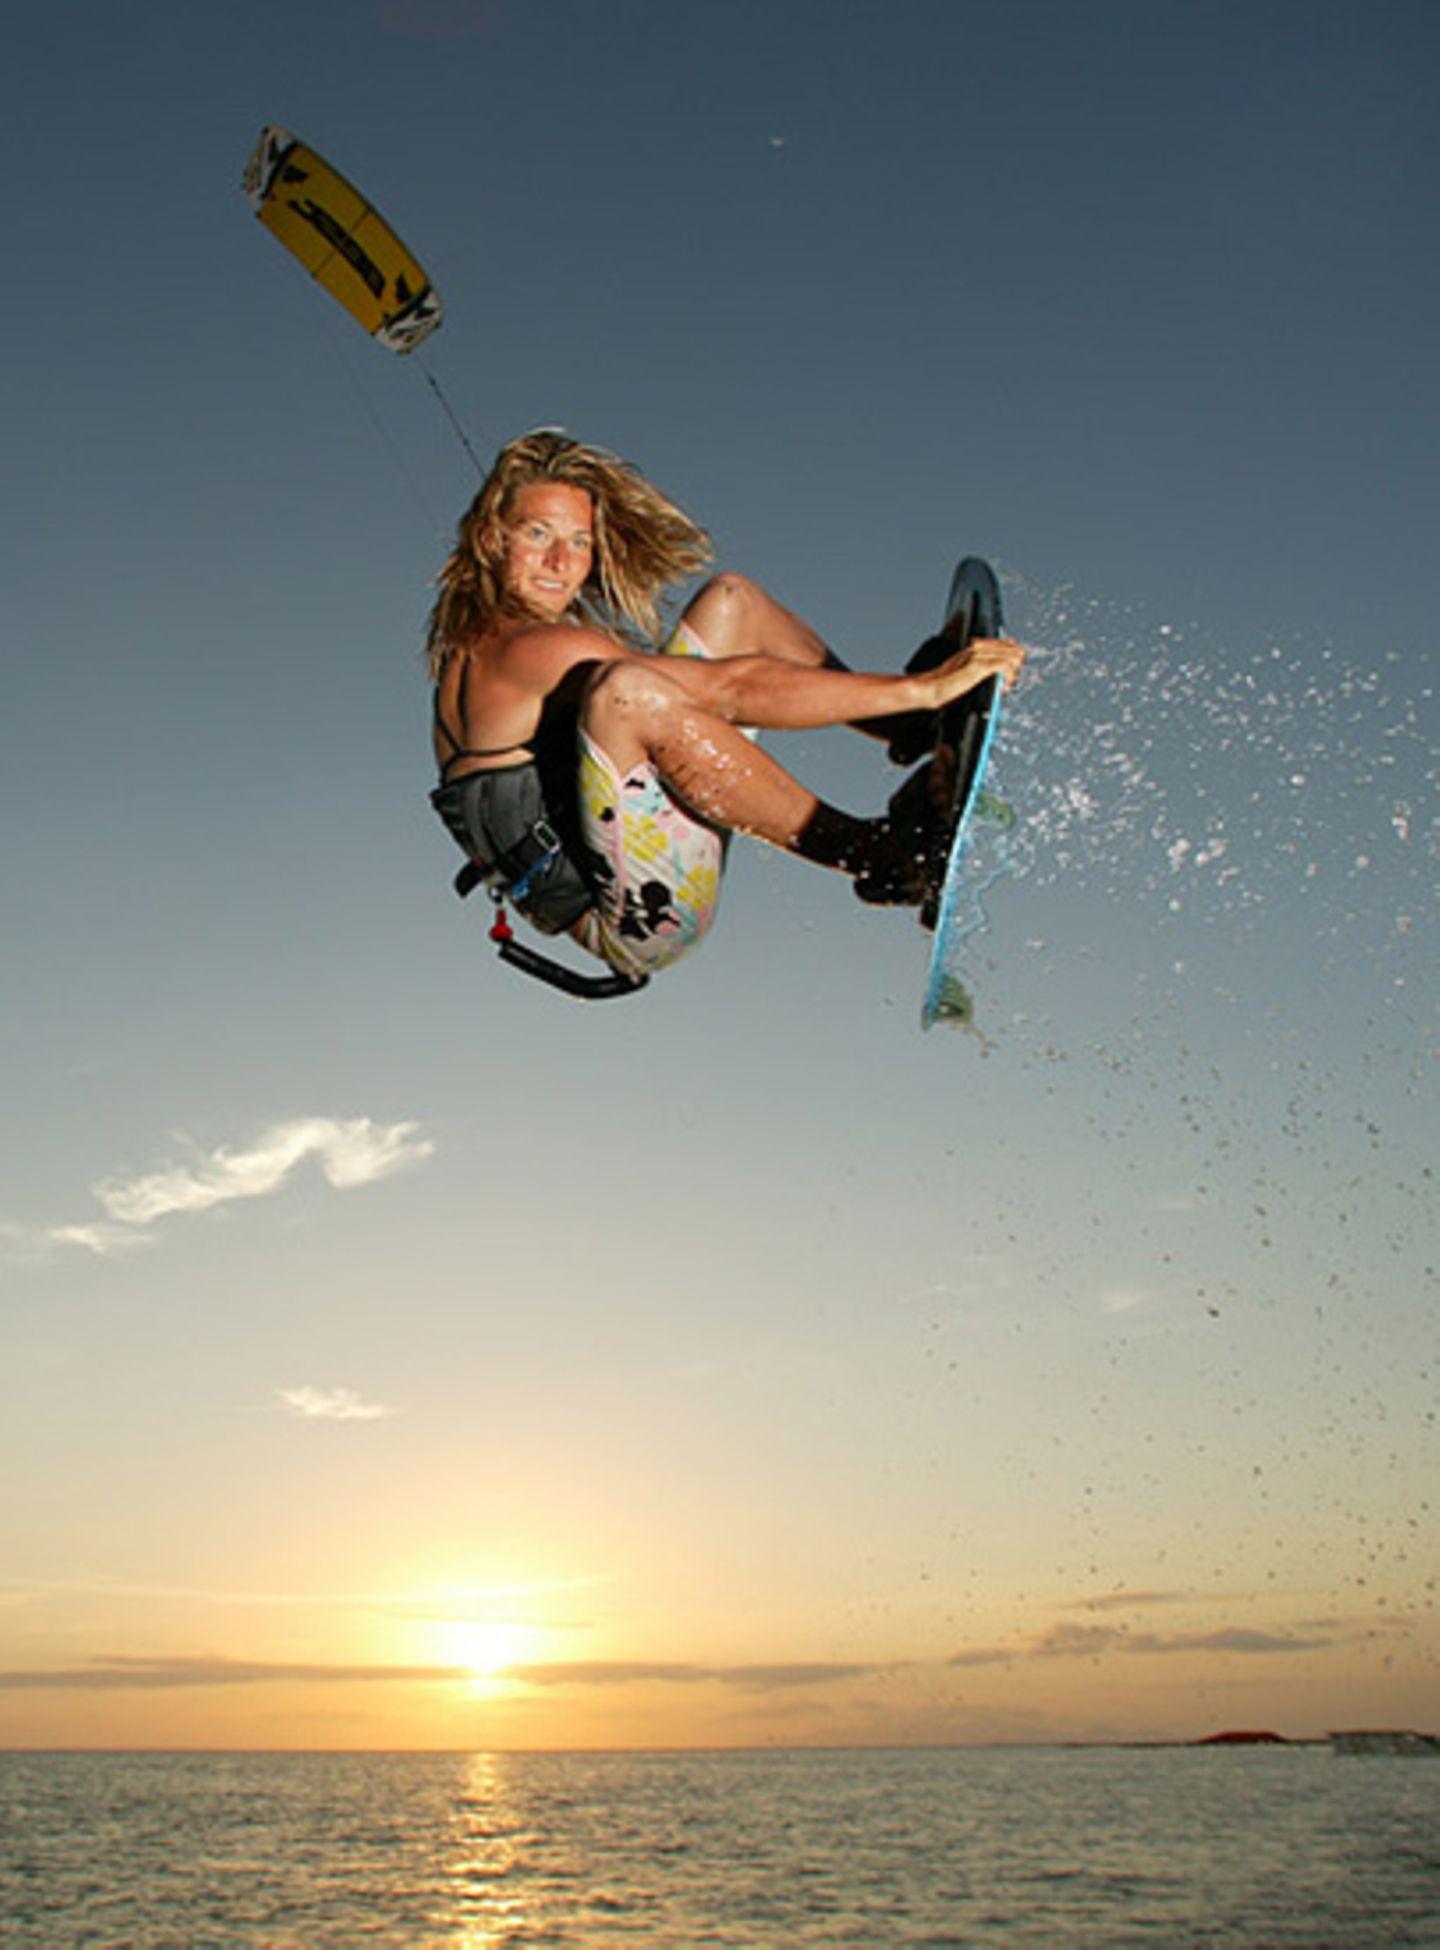 Fotogalerie: Kitesurfen - Bild 7